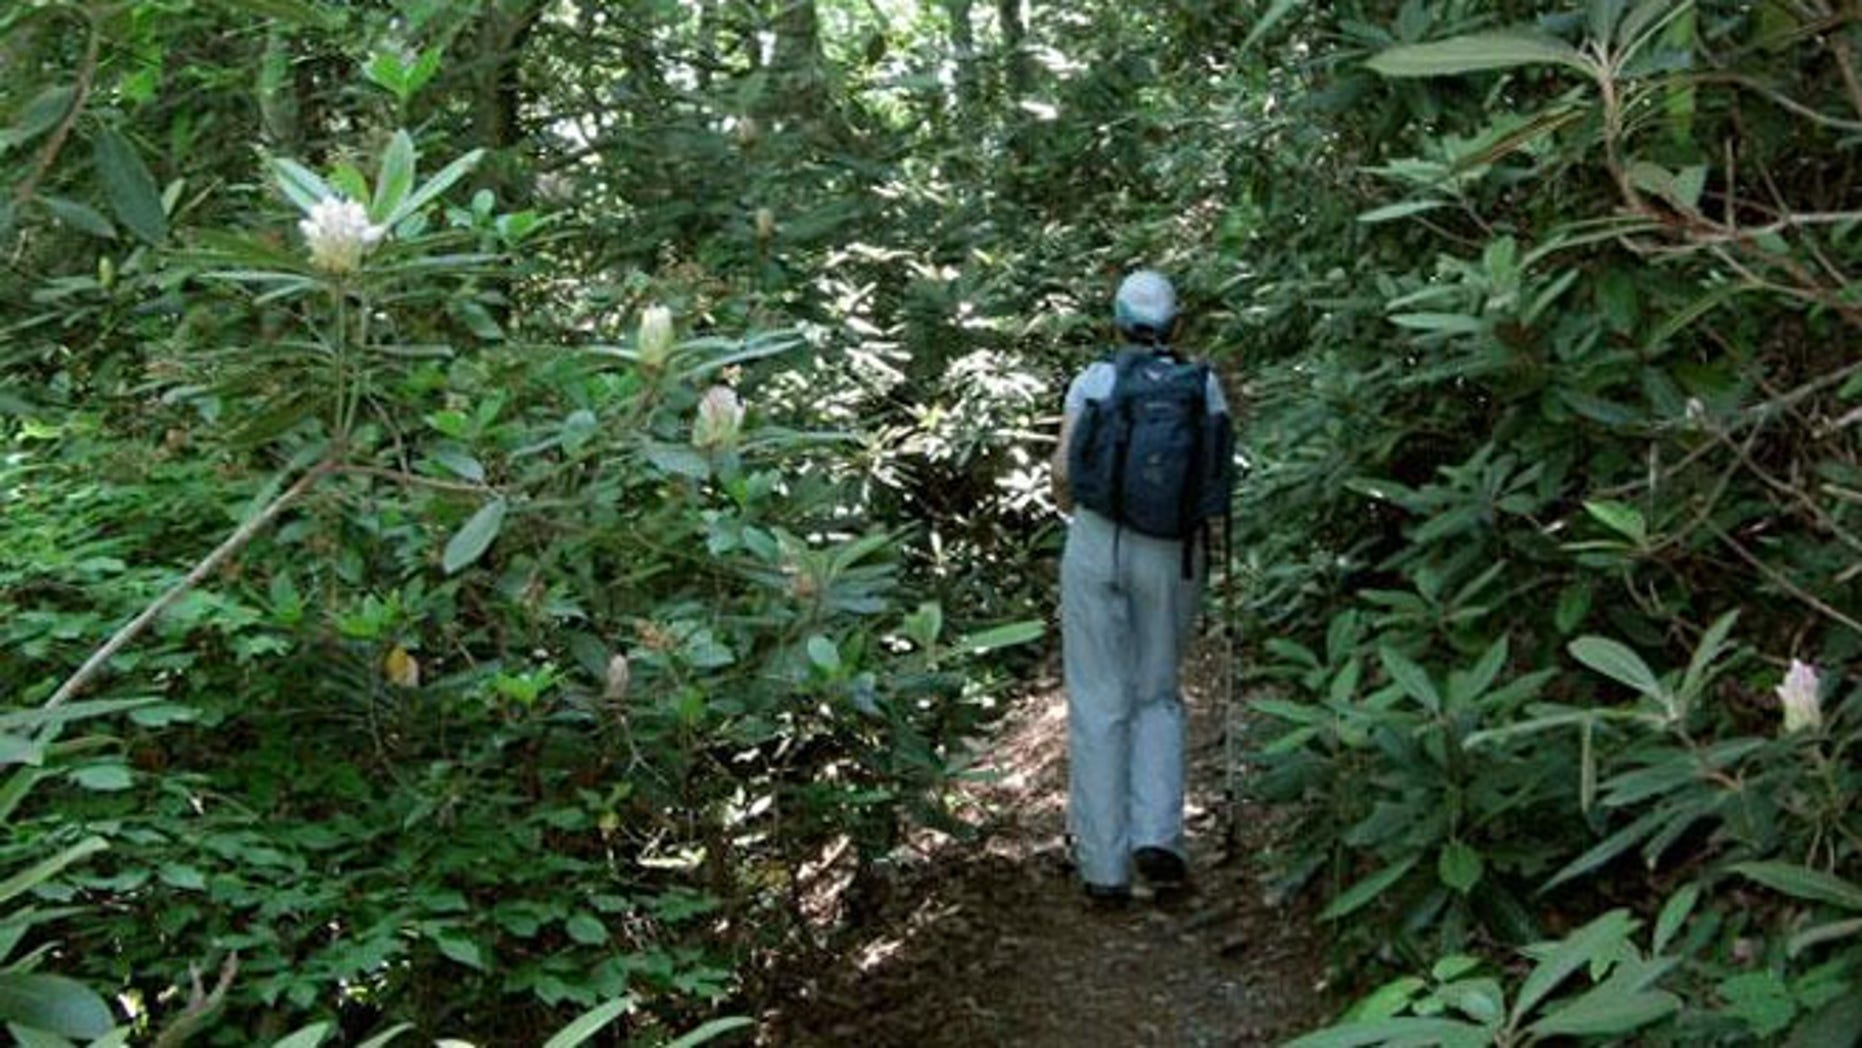 The Appalachian Trail near the tiny Blue Ridge Mountain town of Hot Springs, N.C.